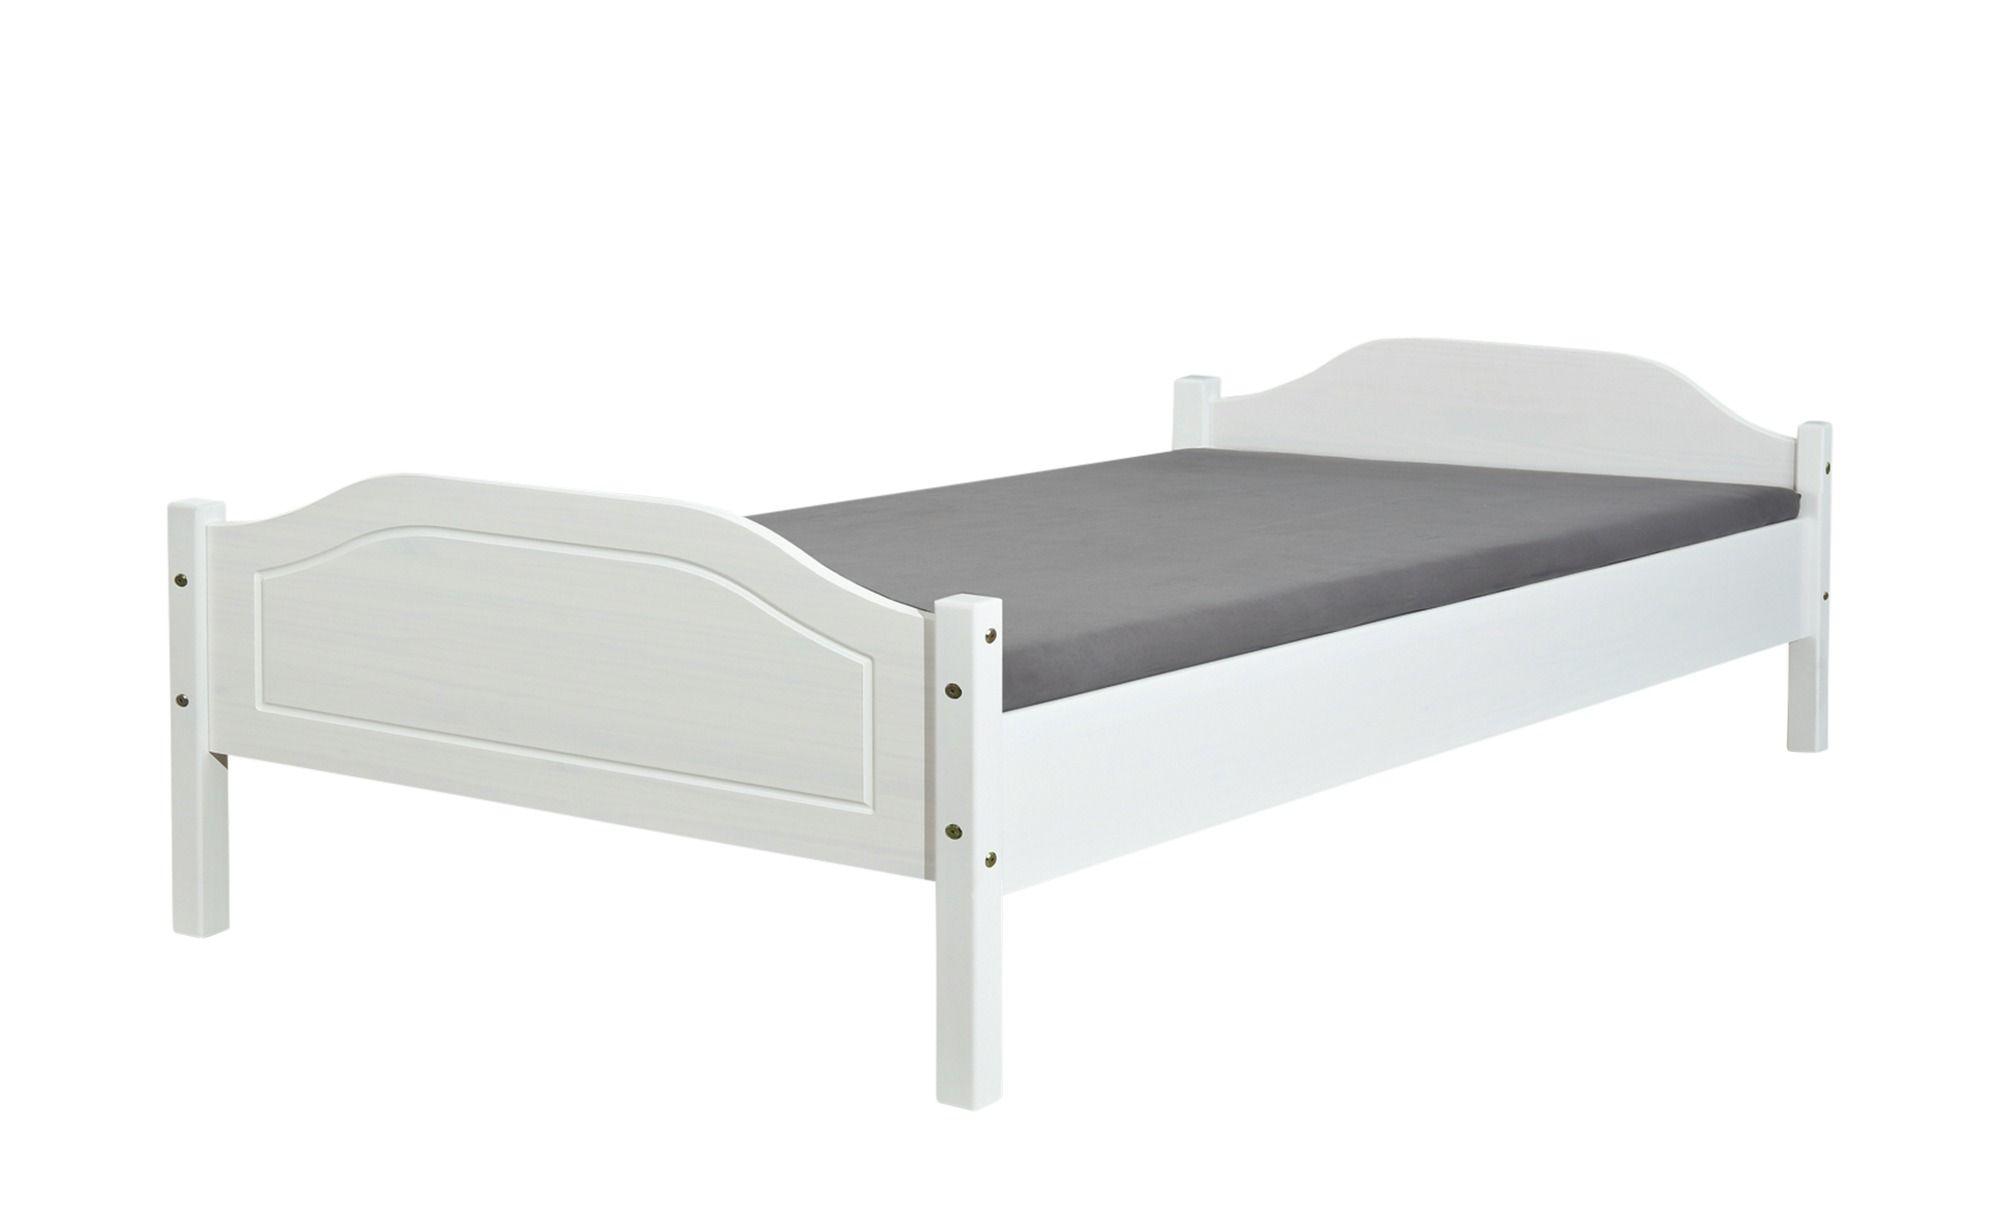 Full Size of Metallbett 100x200 Bettgestell Wei Mae Cm B 187 H 73 T 207 Betten Bett Weiß Wohnzimmer Metallbett 100x200